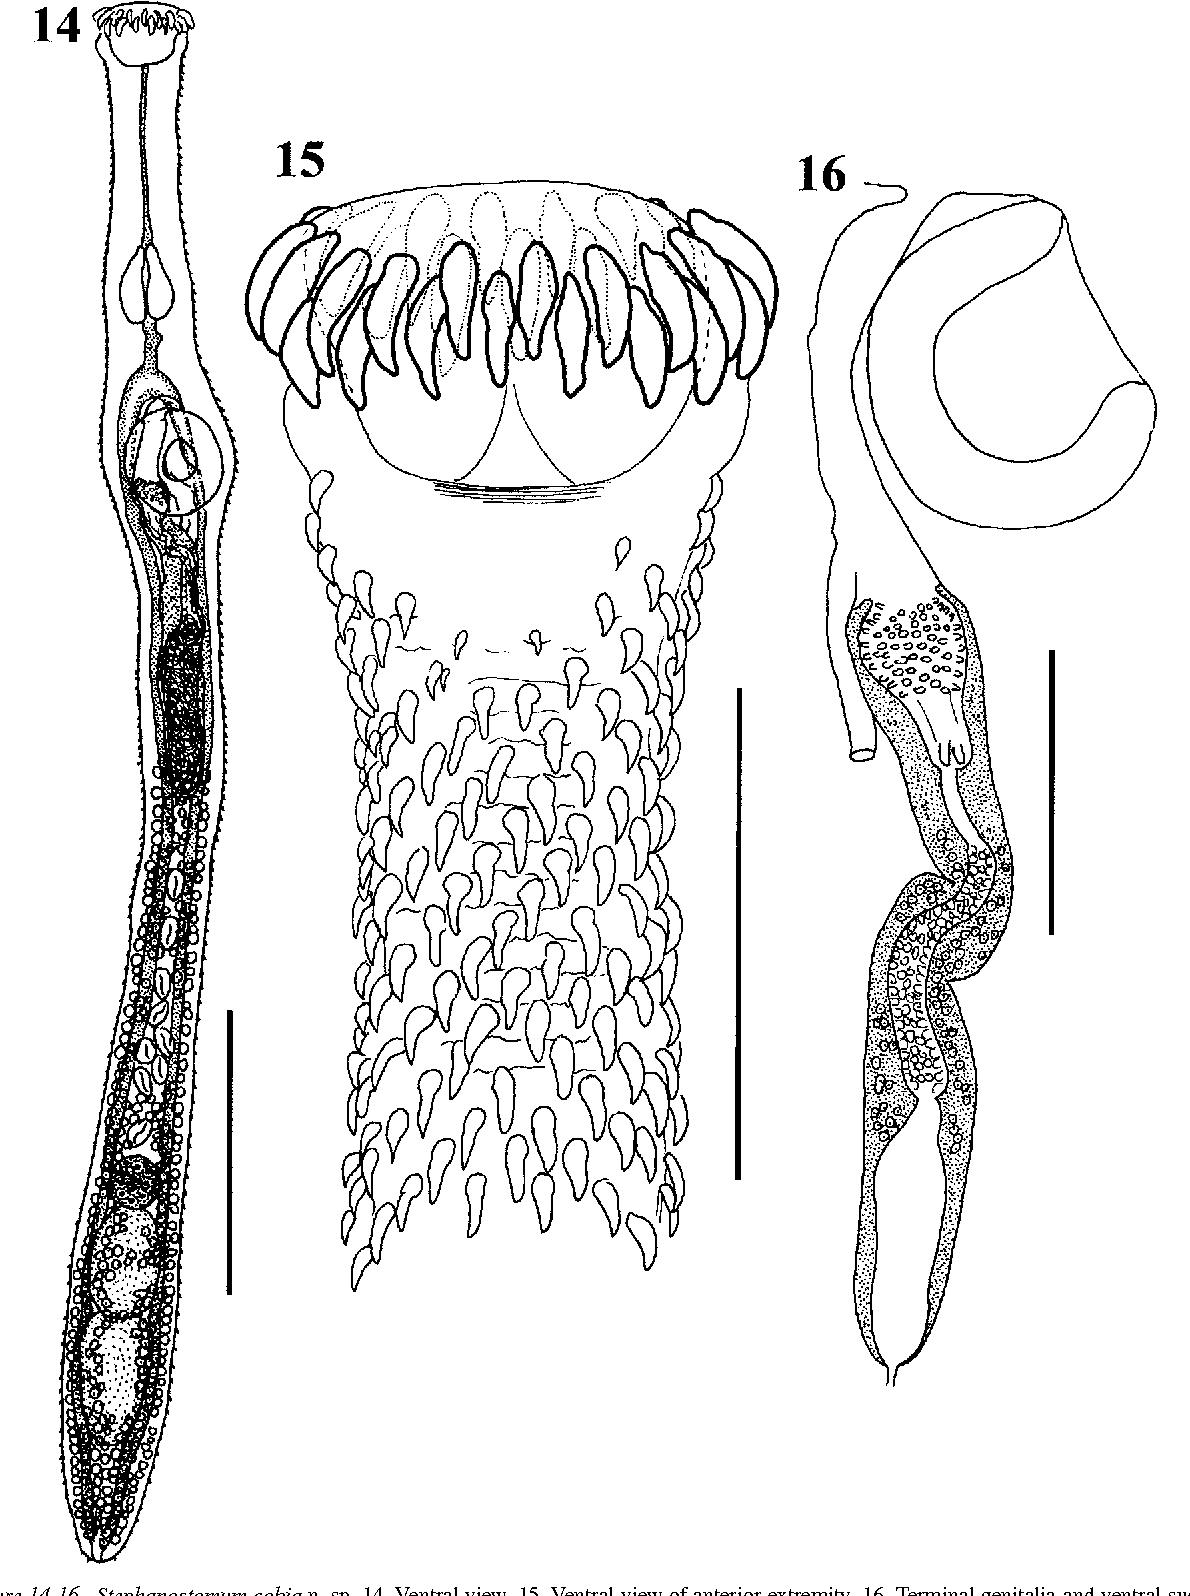 figure 14-16